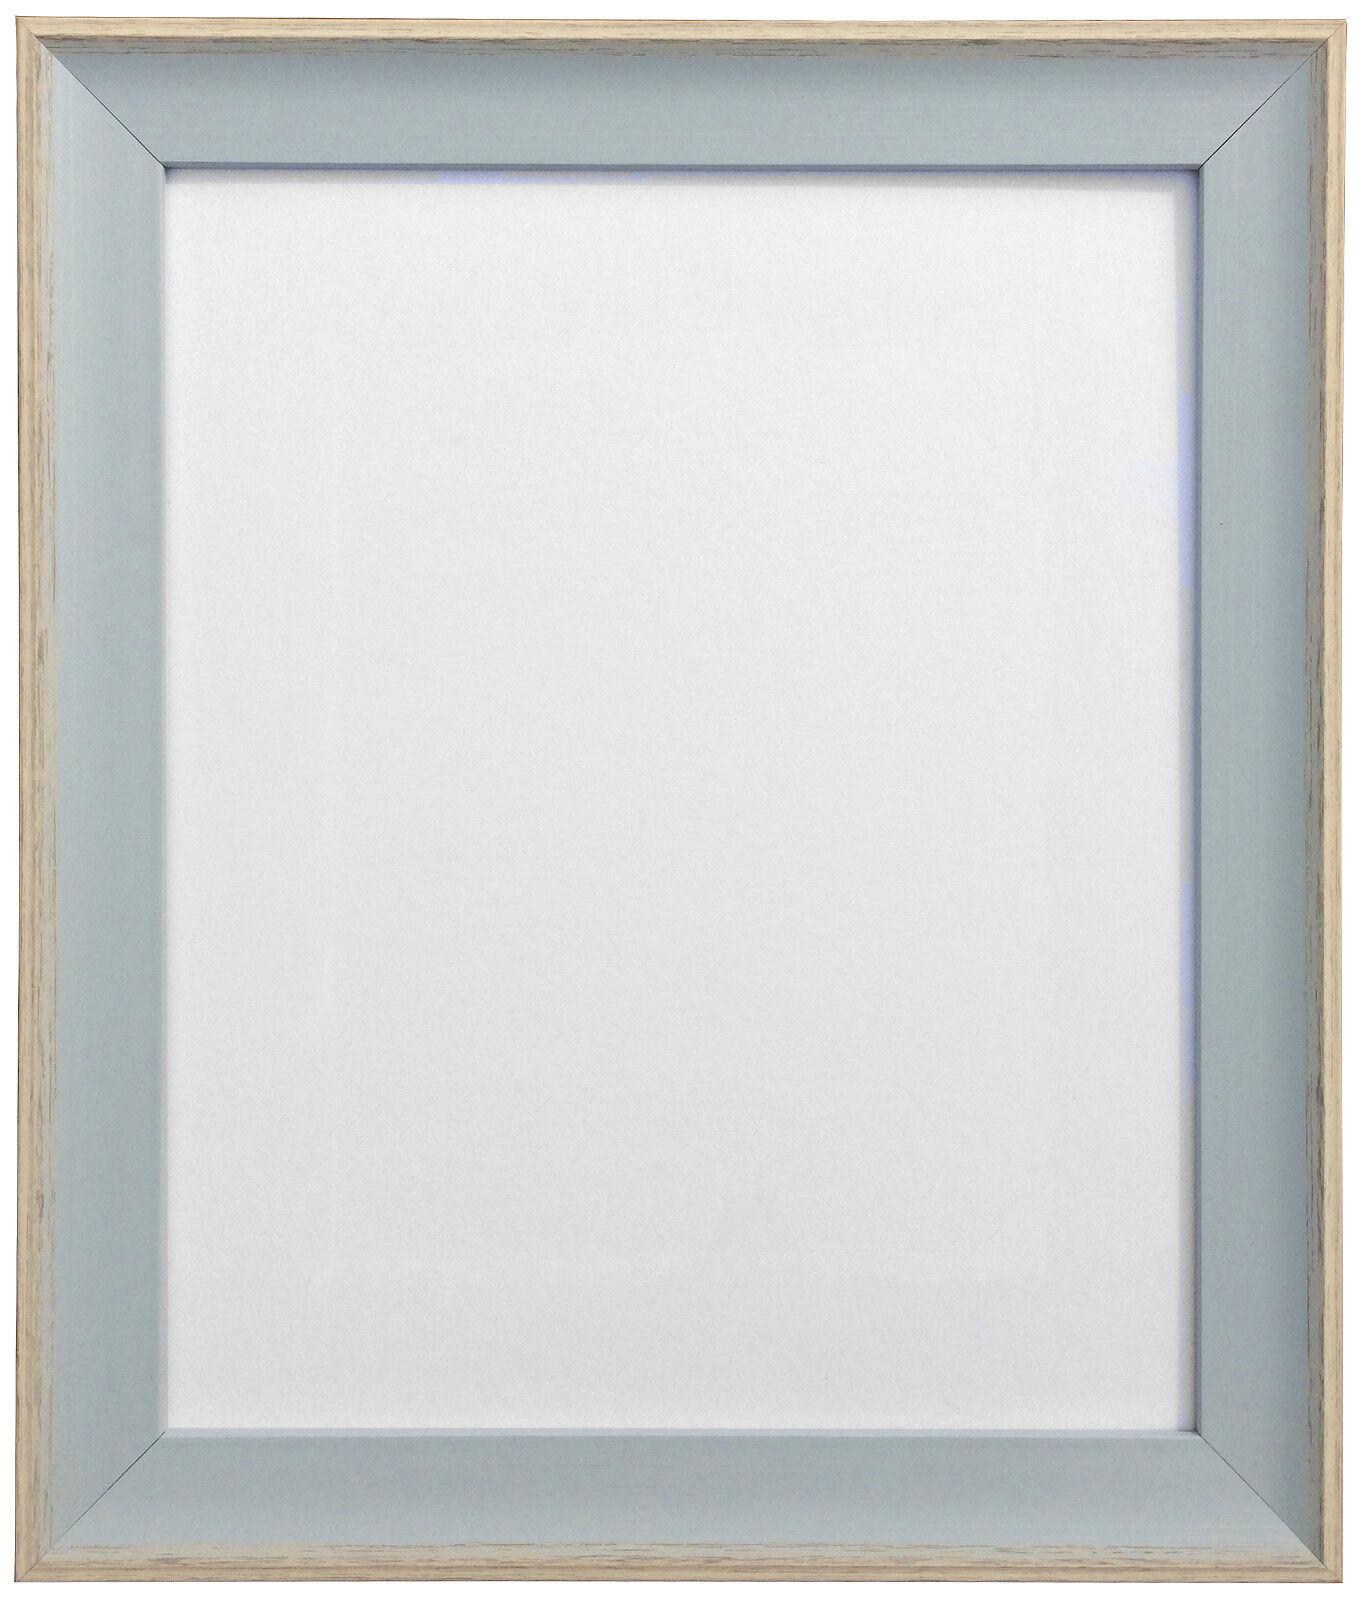 "Gold flat picture photo frame 6/""x4/"" 8/""x6/"" 10/""x8/"" 12/""x10/"" 14/""x11/"" A4  20/"" X 16/"""